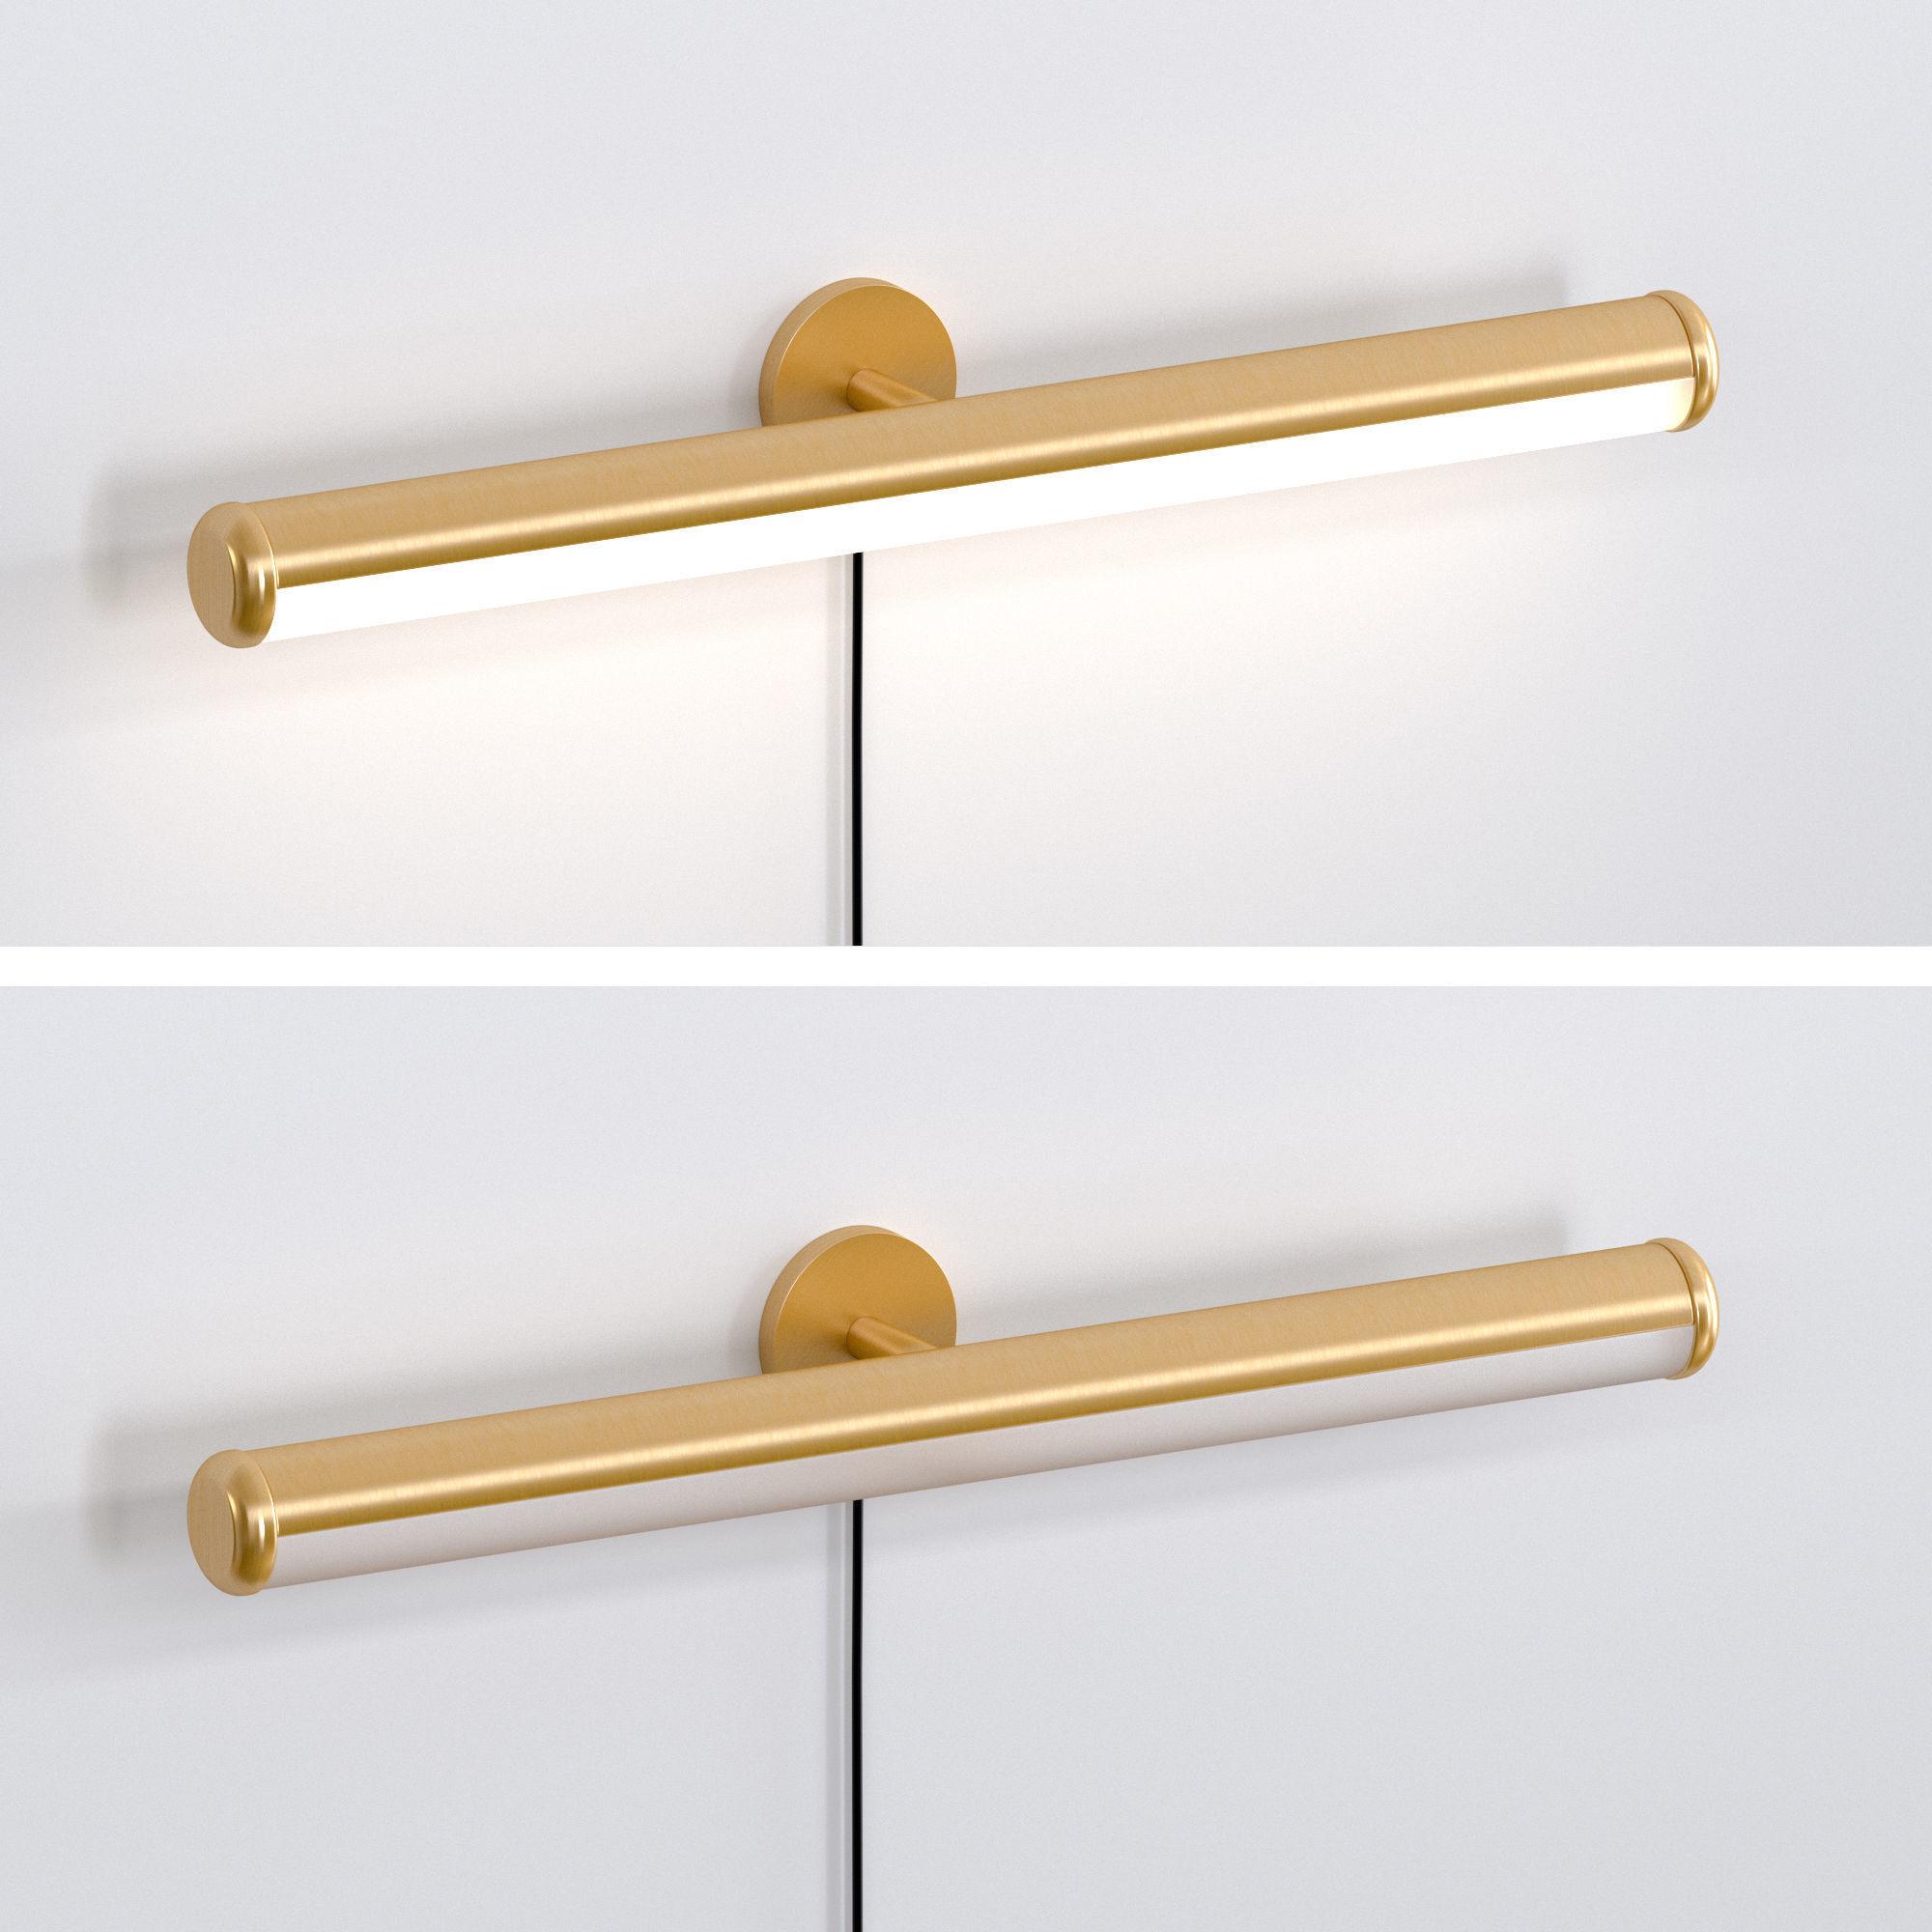 west elm light rods led art sconce 3d model